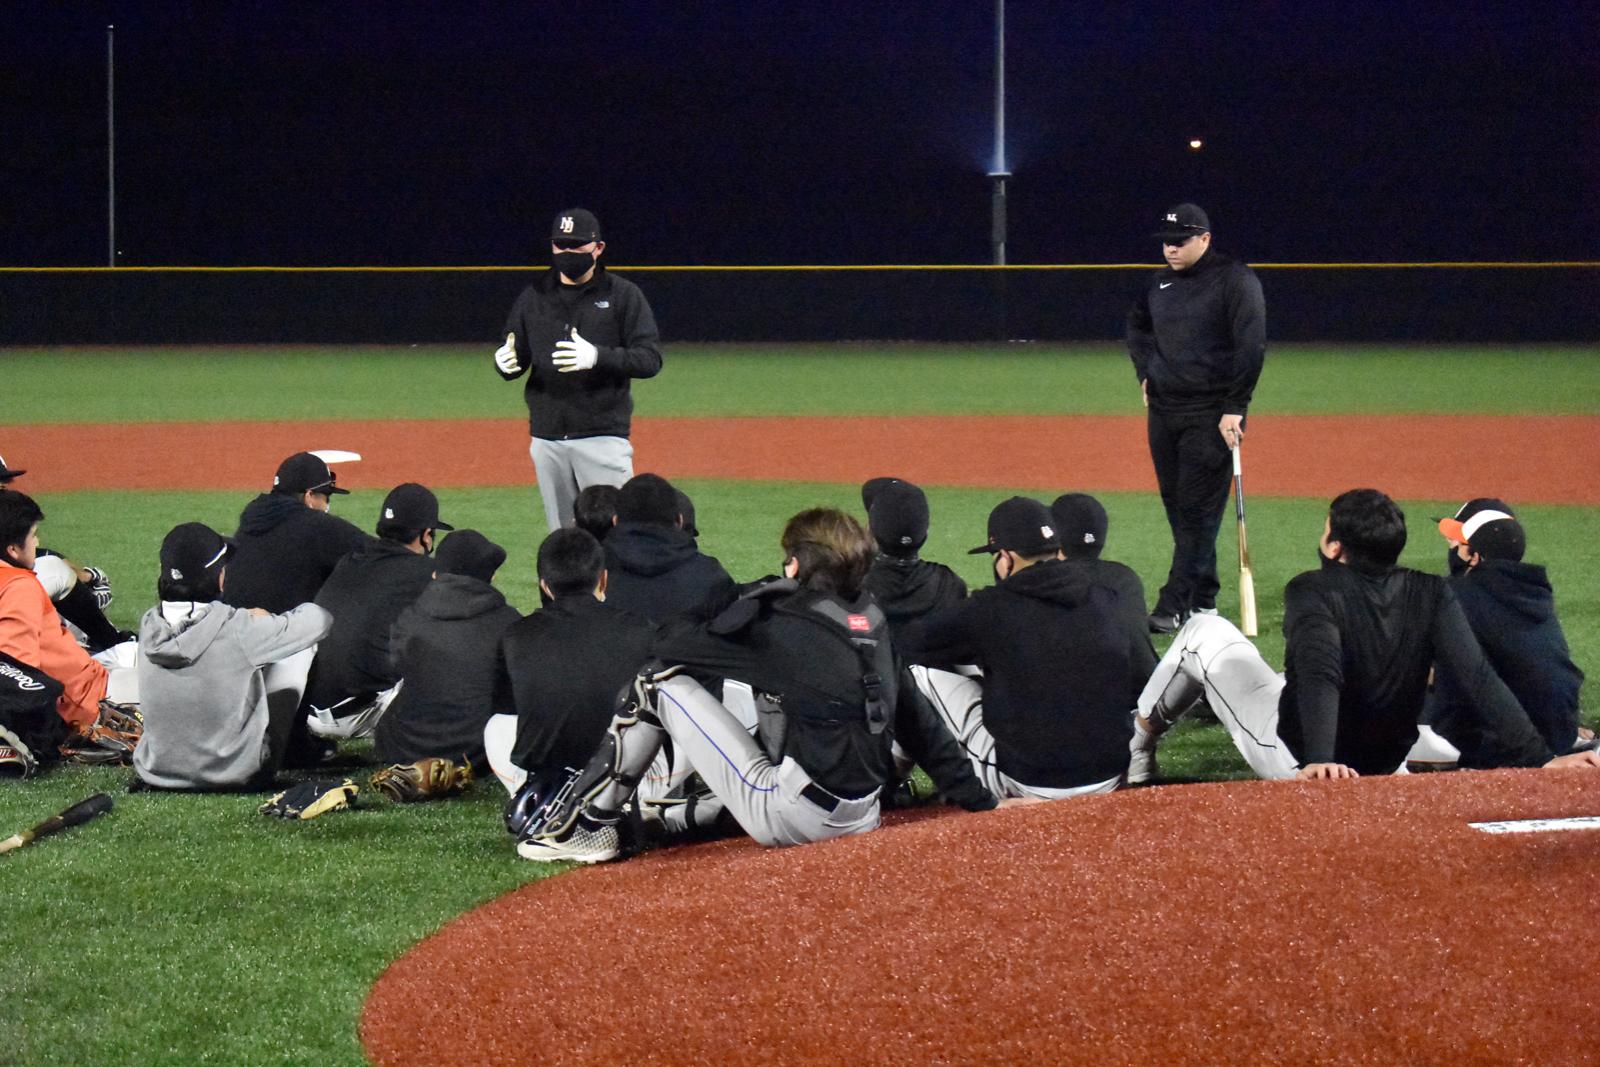 Photo gallery: North Dallas baseball team practice — Jan. 28, 2021